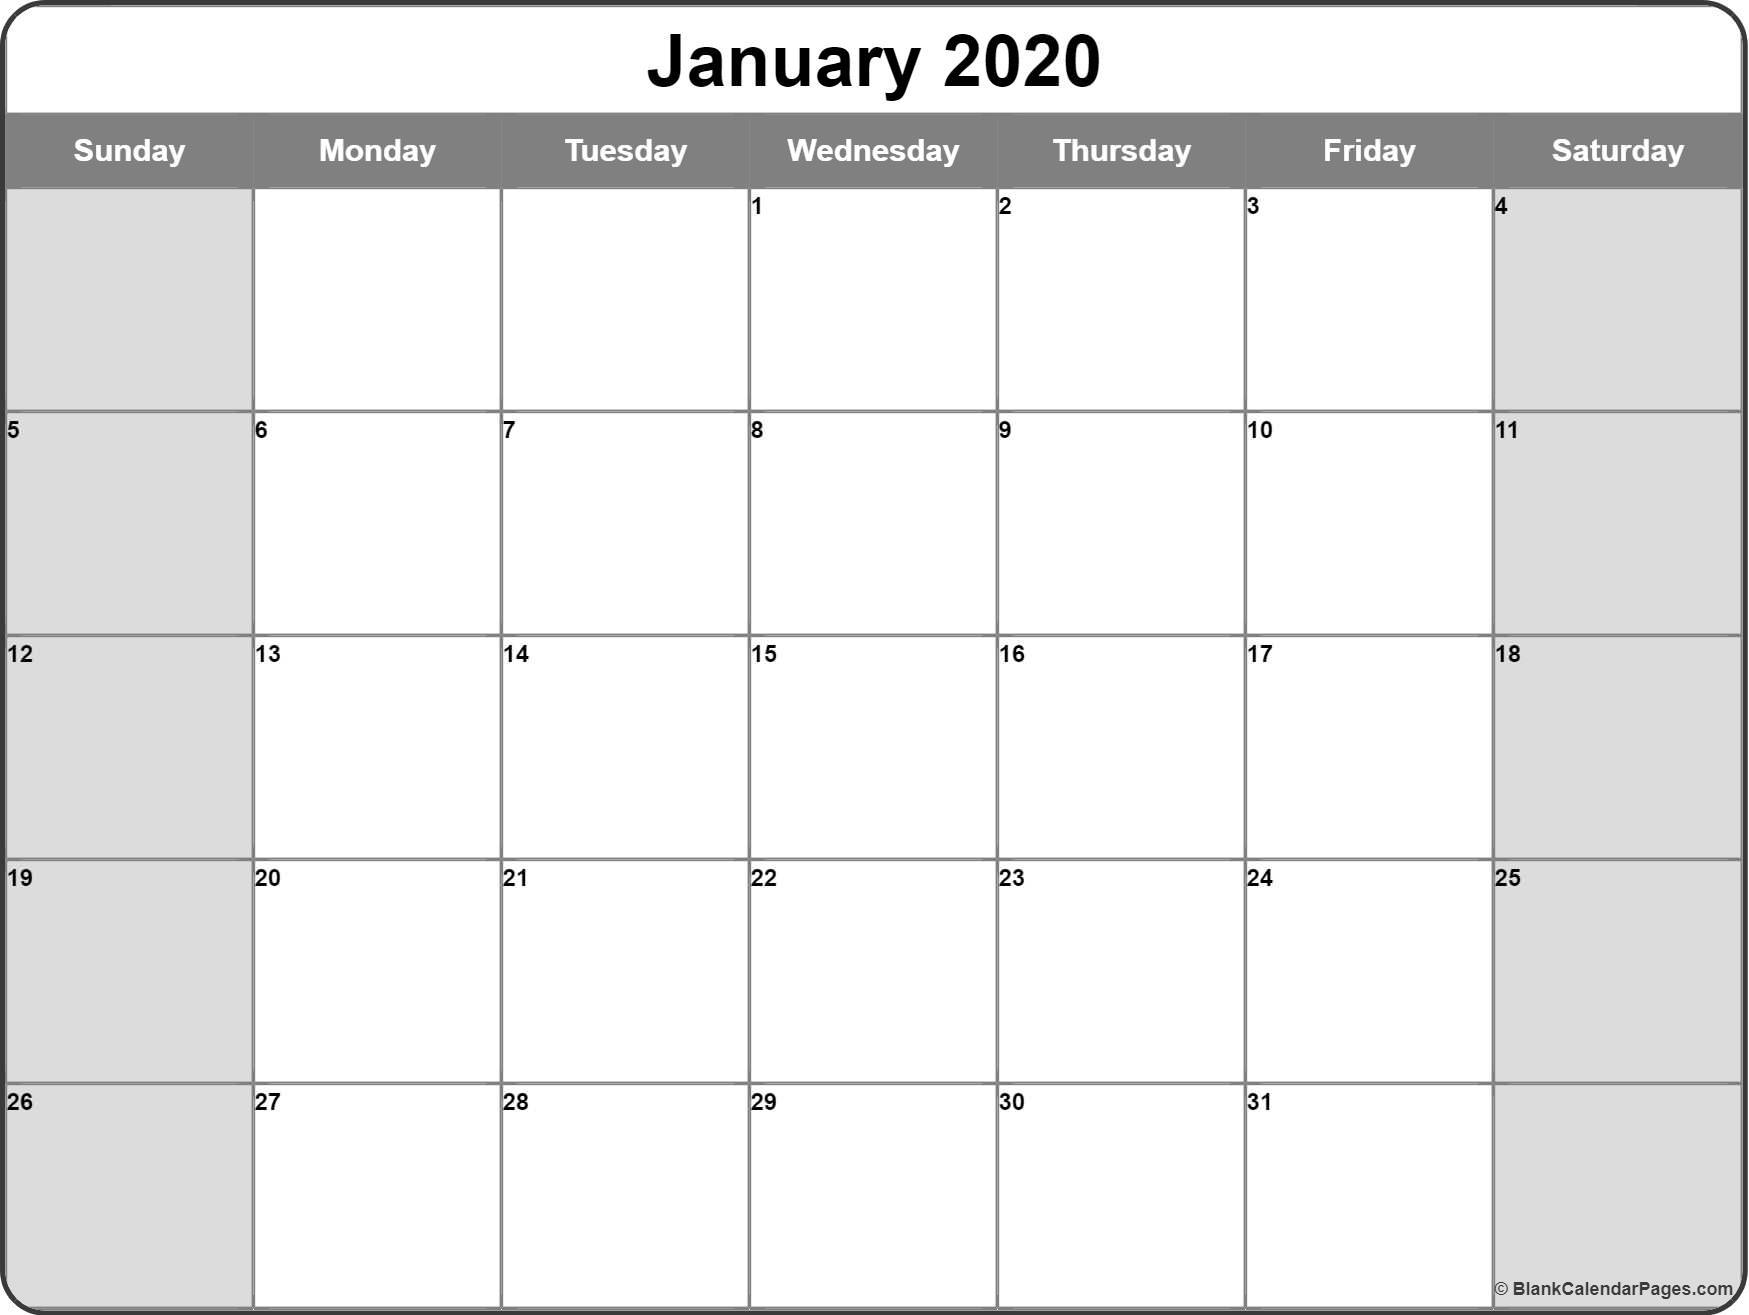 January 2020 Calendar | Free Printable Monthly Calendars pertaining to 2020 Imom Calendar Printable